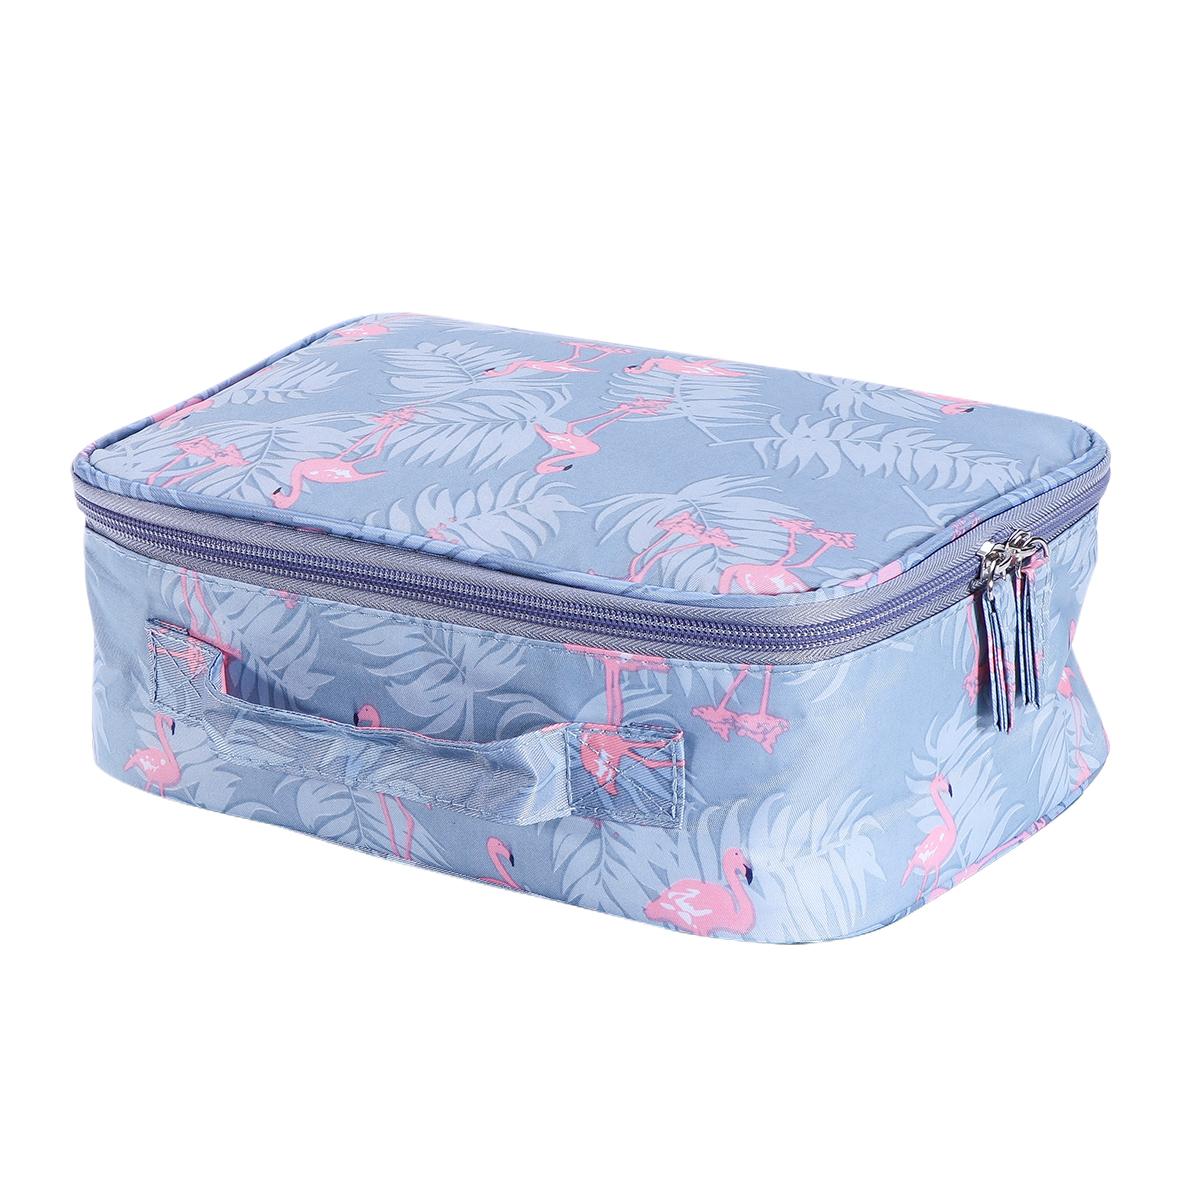 Portable Cosmetic Travel Bag Makeup Brush Organizer kit (Gray Flamingo)